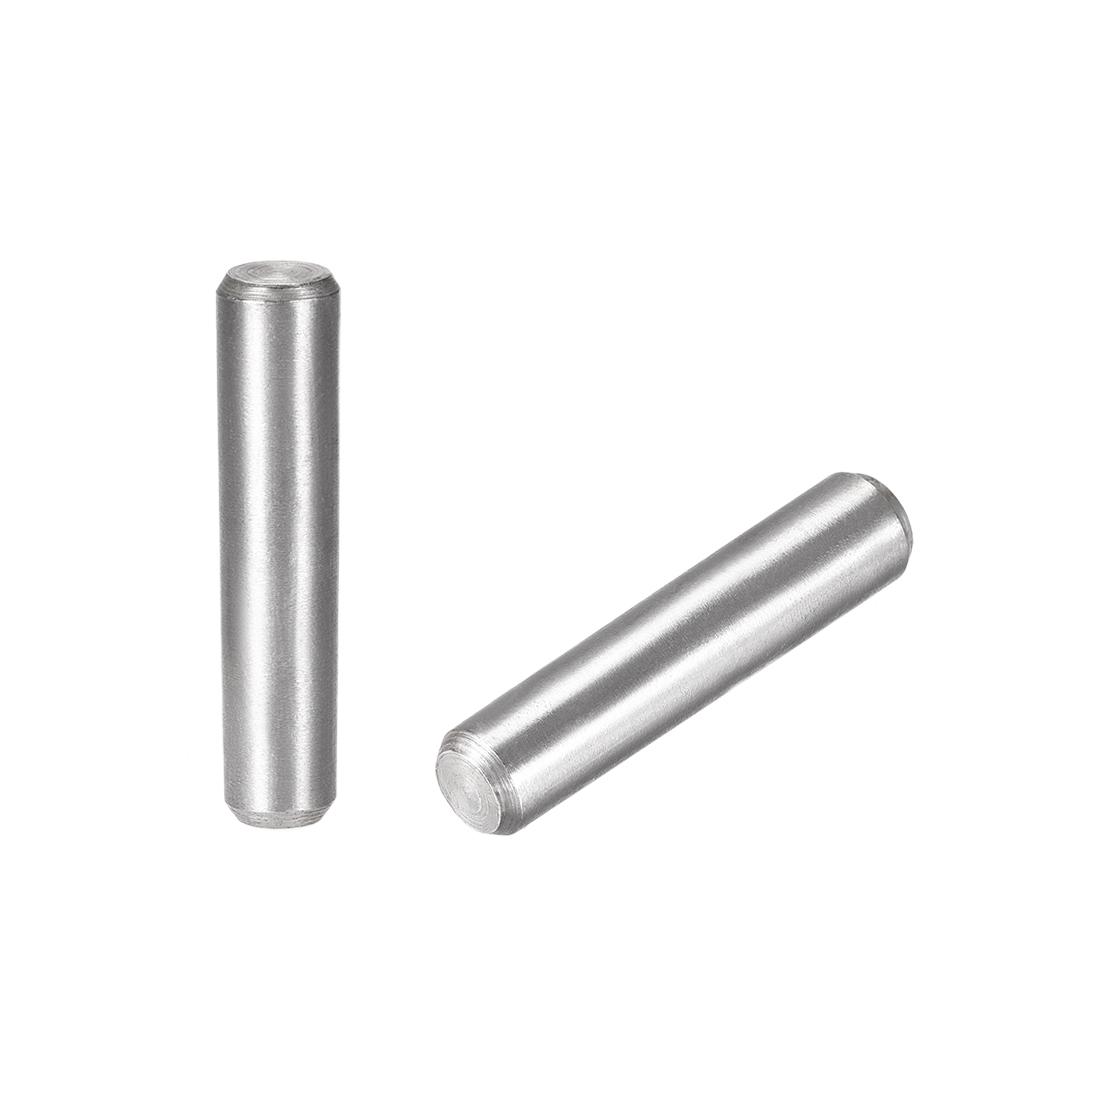 Carbon Steel GB117 60mm Length 12mm x 13mm Small End Diameter 1:50 5 Pcs